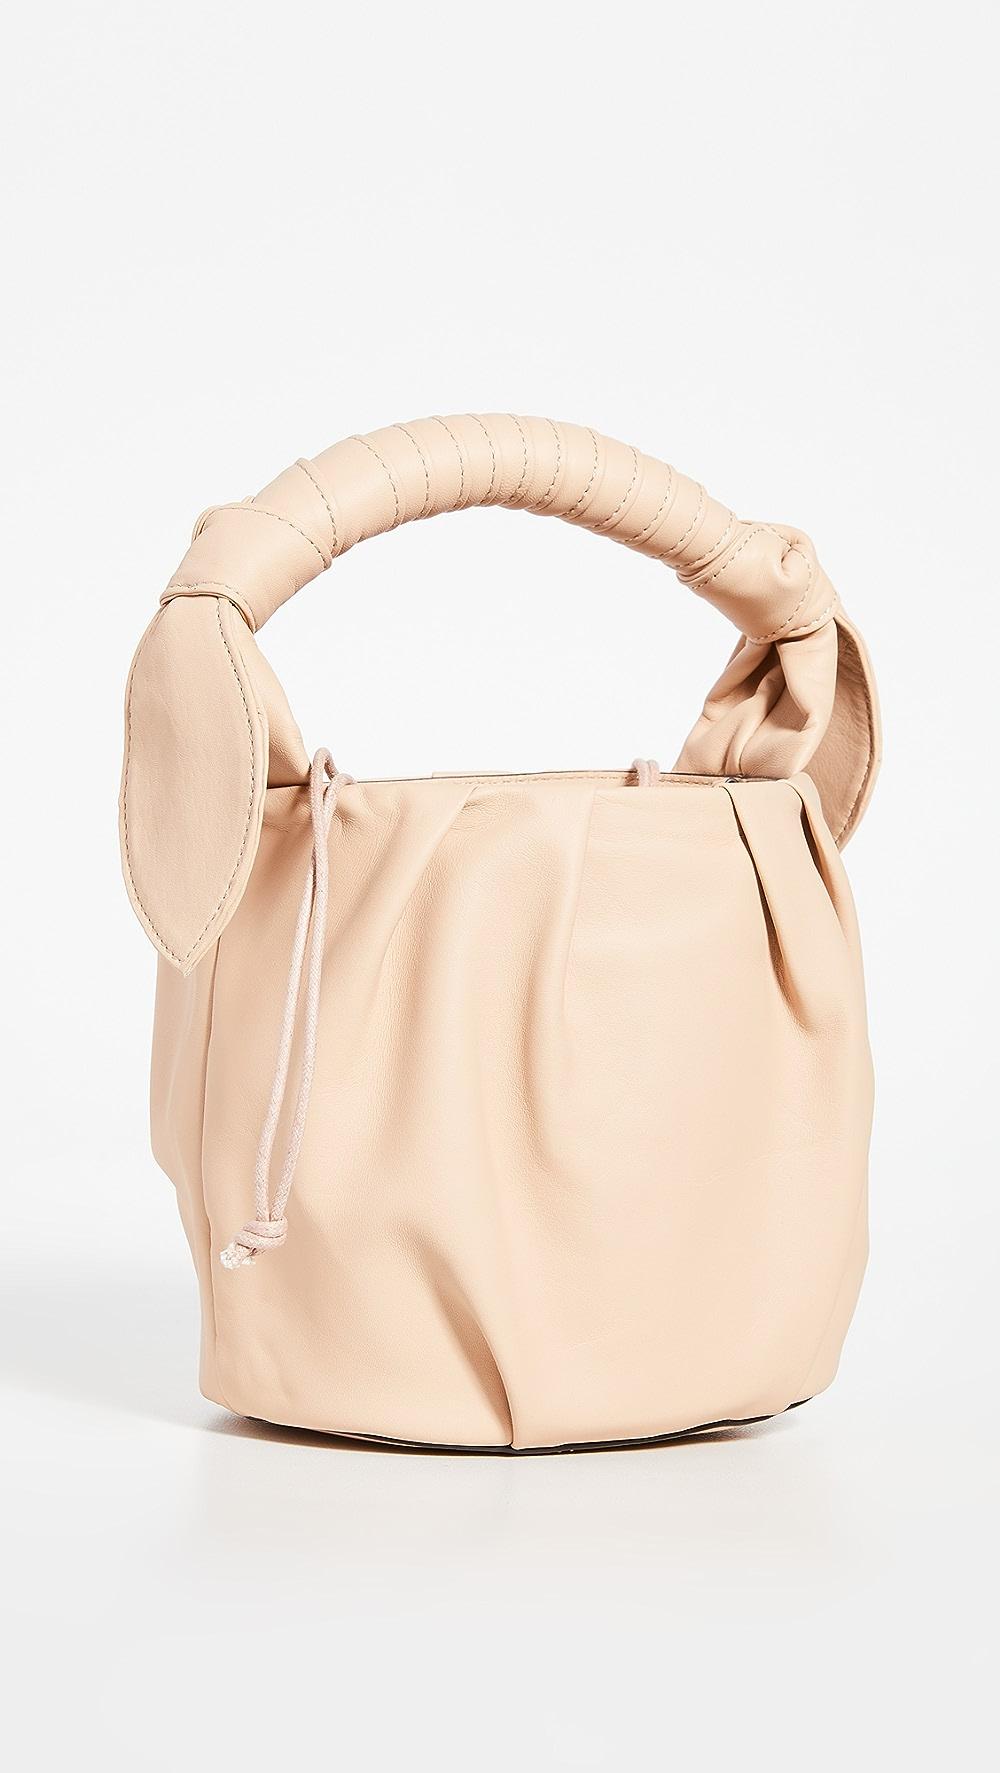 2019 Fashion Staud - Dani Bag Modern Techniques